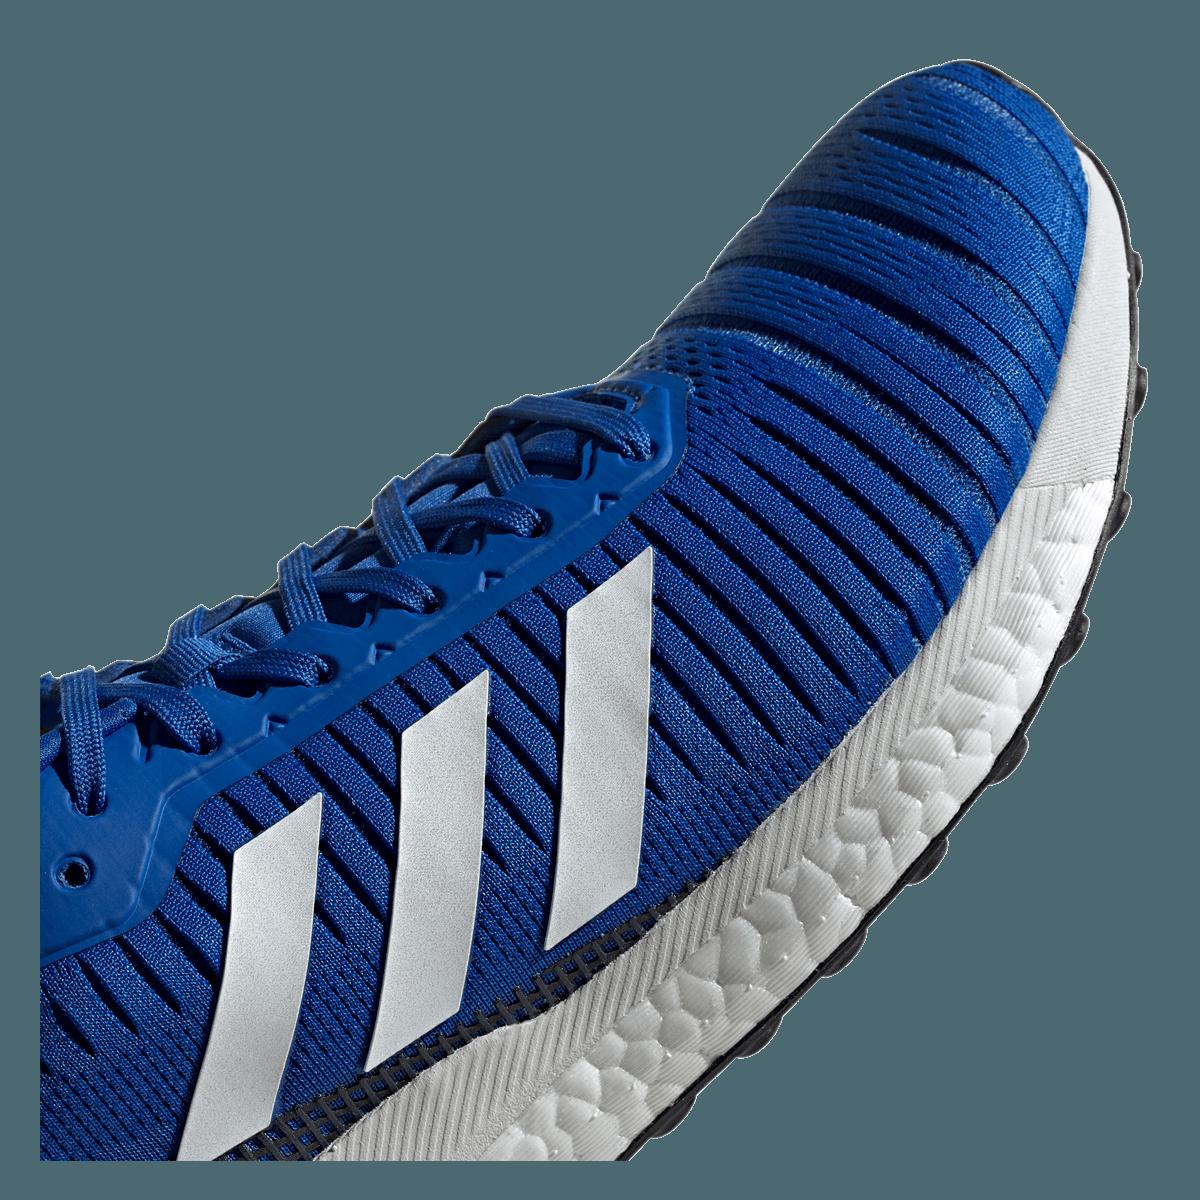 adidas Laufschuh Solar Glide 19 M blaudunkelblau